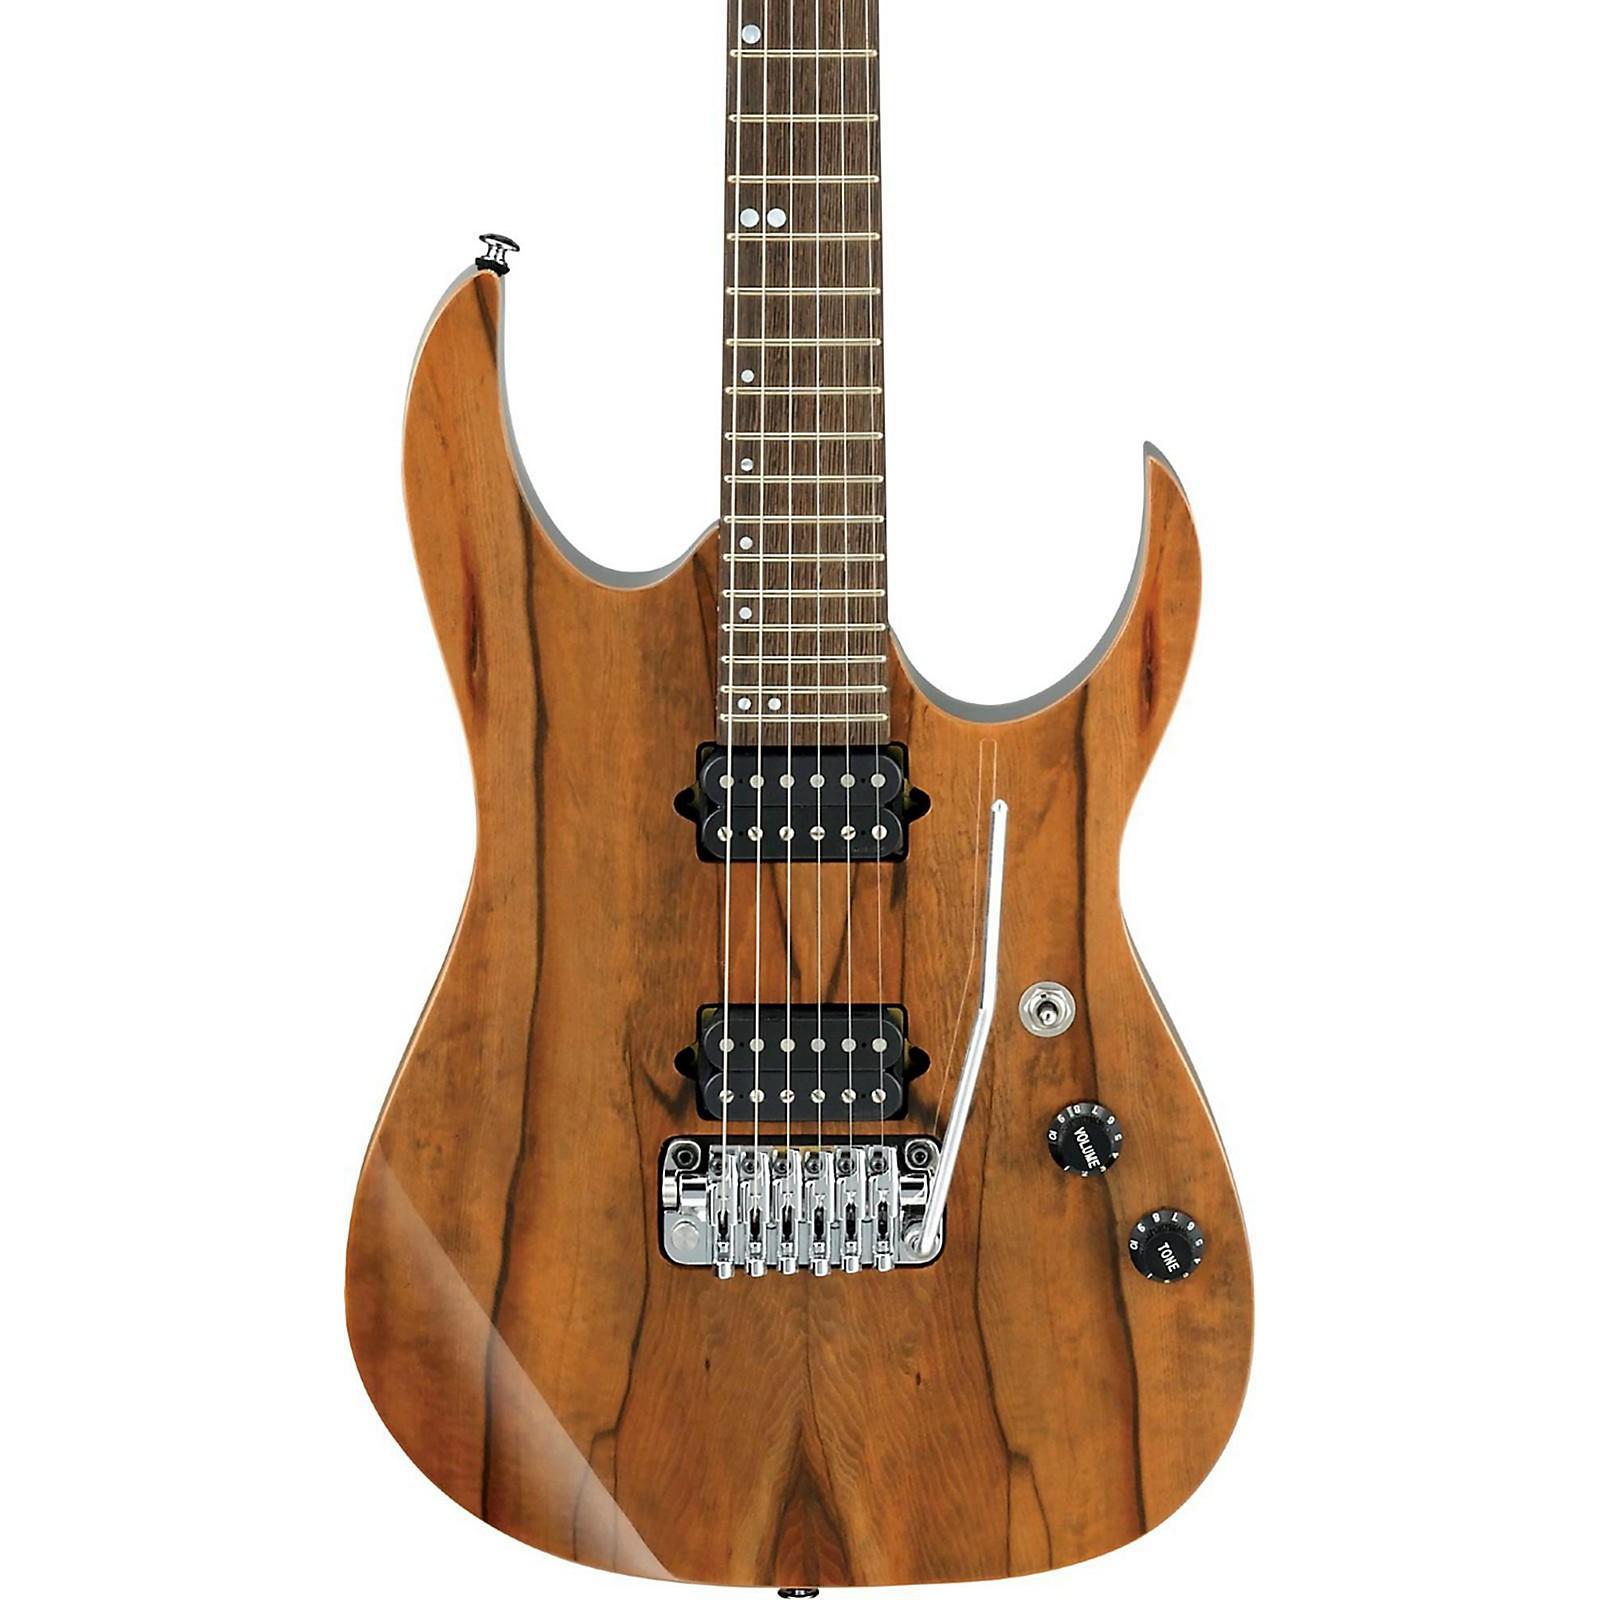 Open Box Ibanez Marco Sfogli Signature MSM1 Electric Guitar